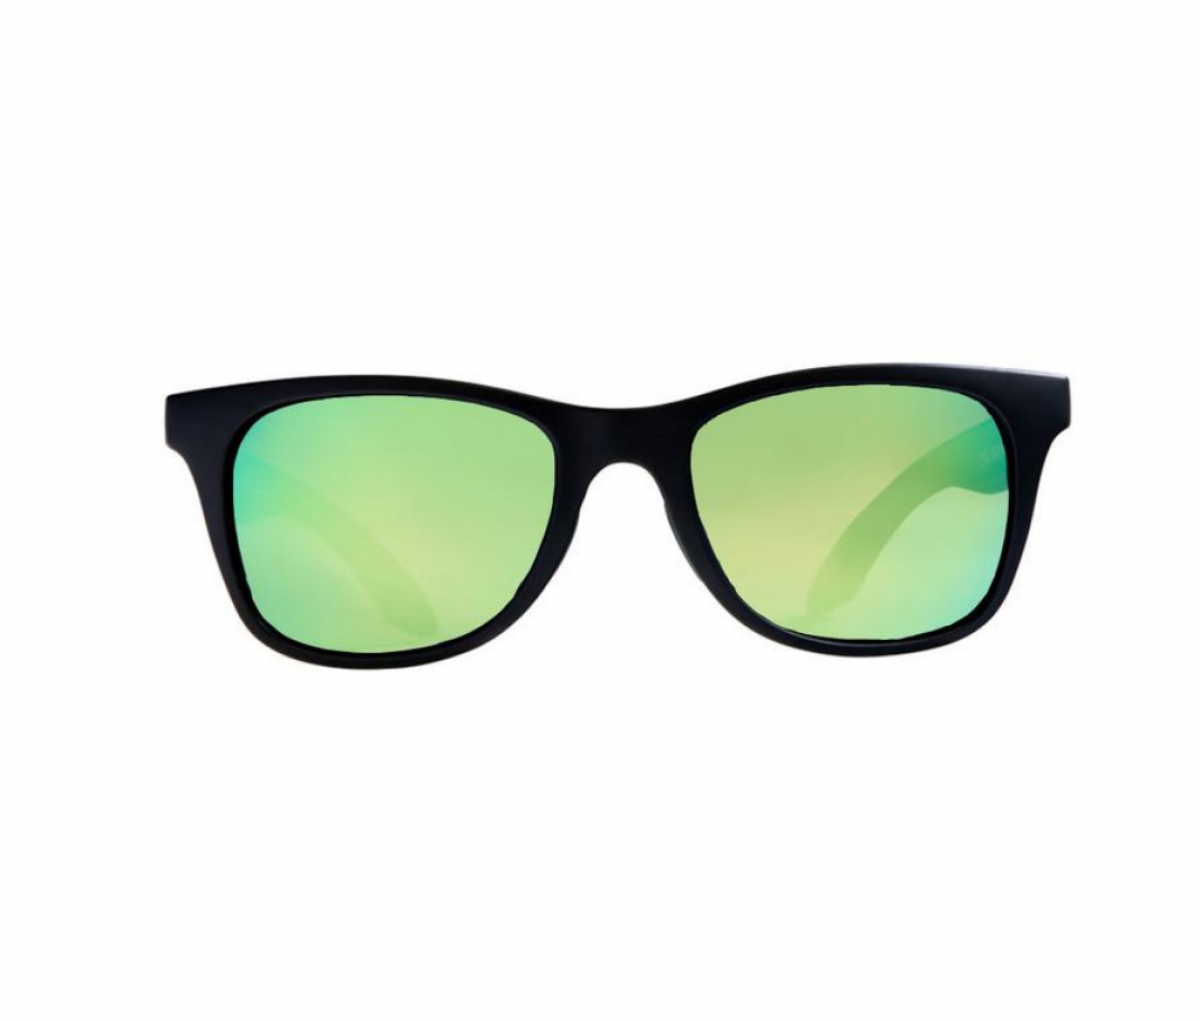 RHEOS Waders Gunmetal Frame & Emerald Lens 2011-130